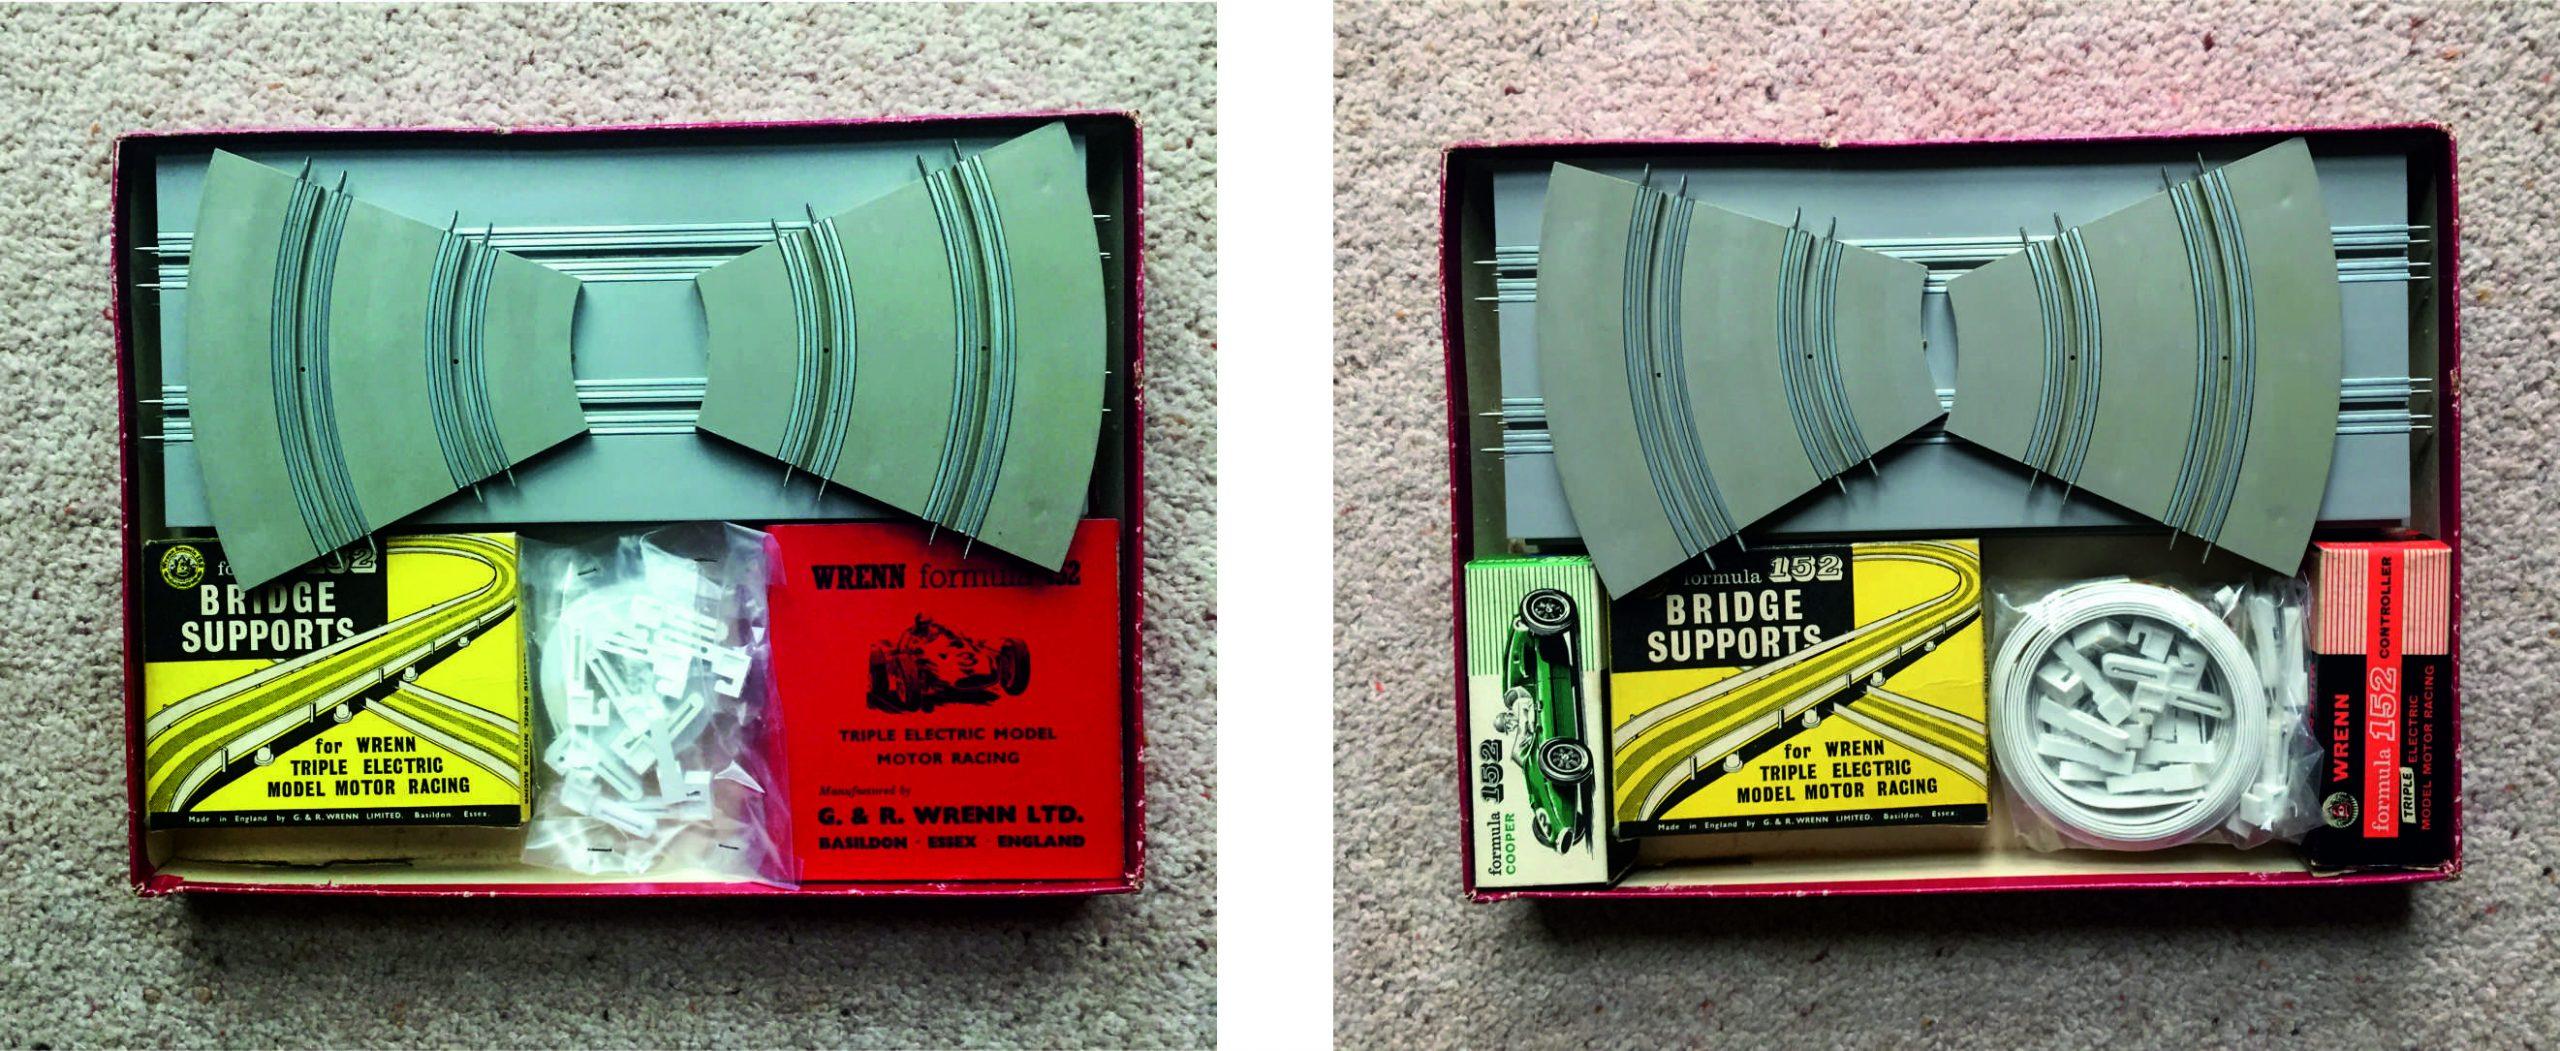 Wrenn 152 Extension Pack Types 1 & 1A